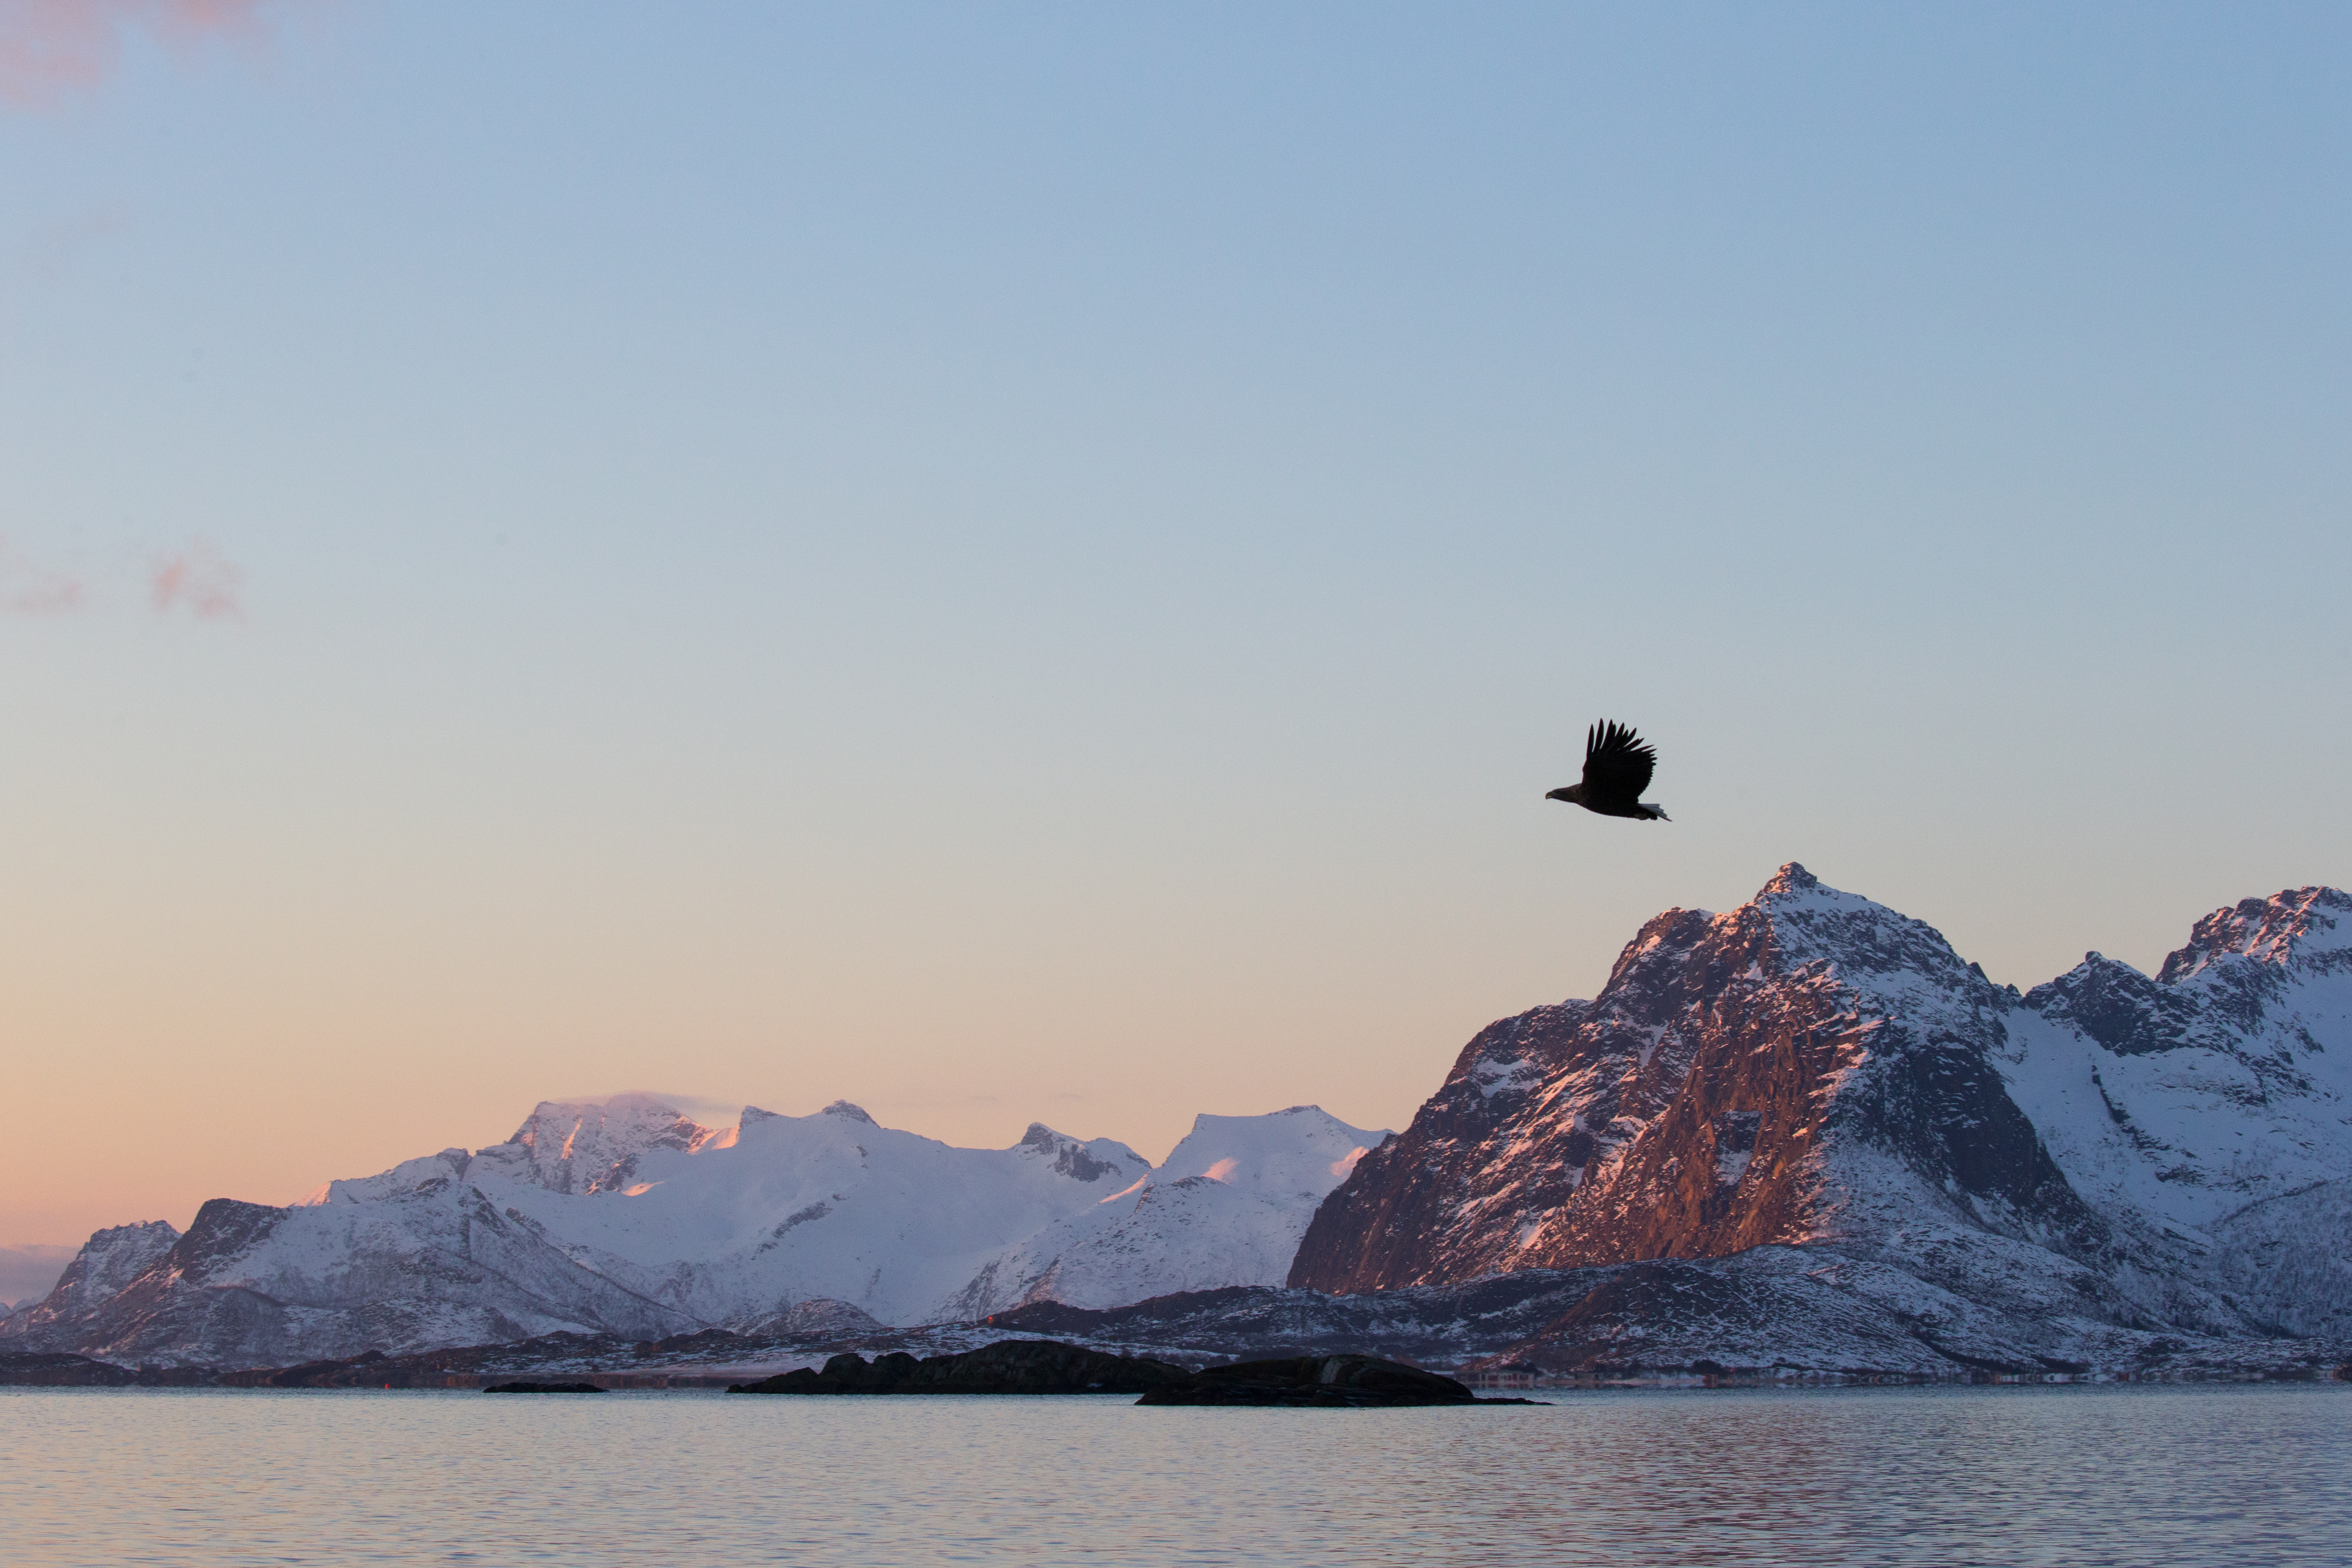 Lofoten 2018 - David Wolberg